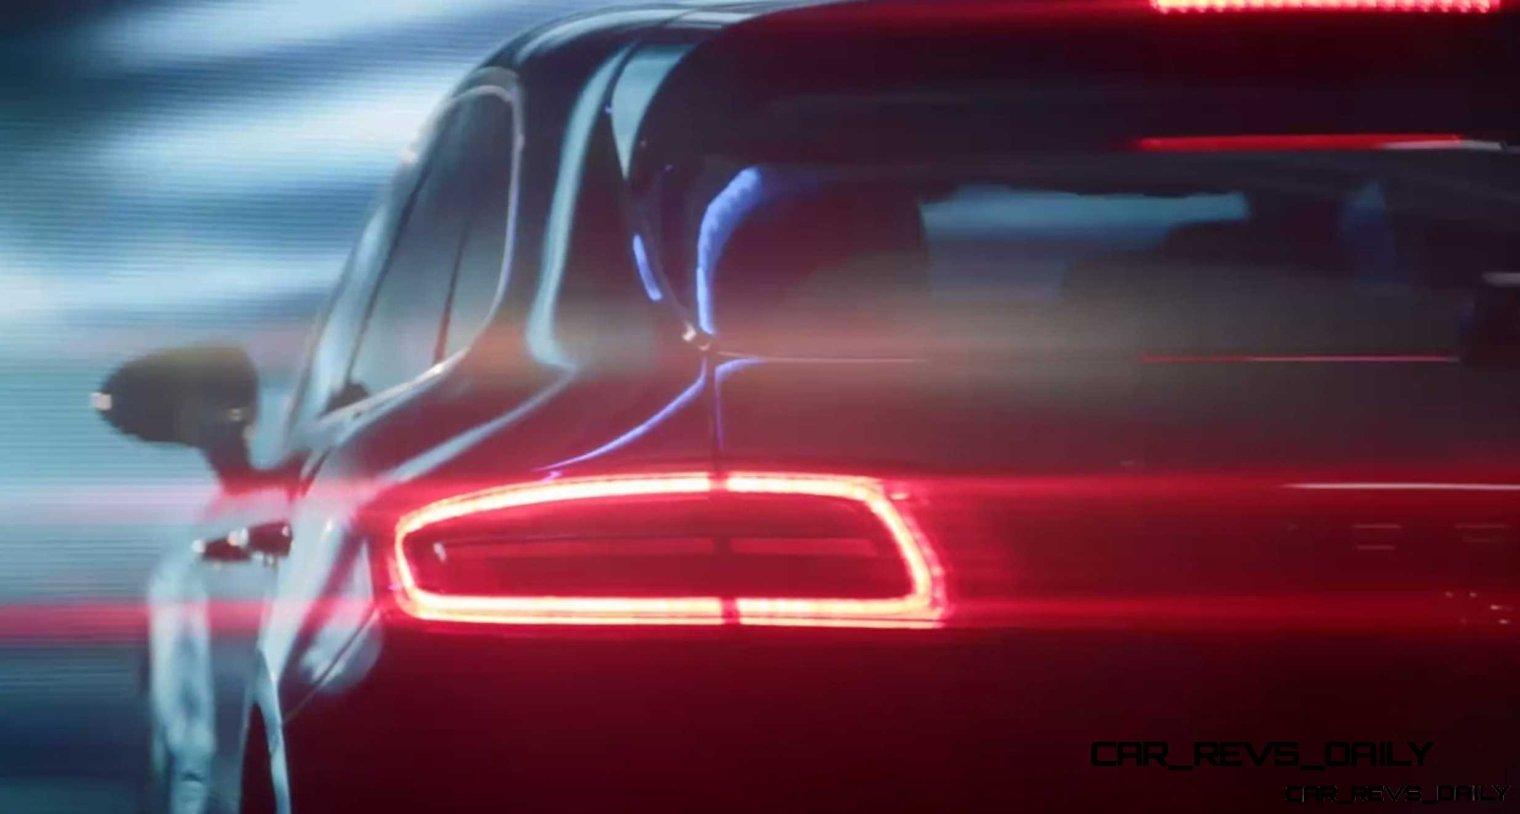 2015 Porsche Macan - Latest Images - CarRevsDaily.com 38